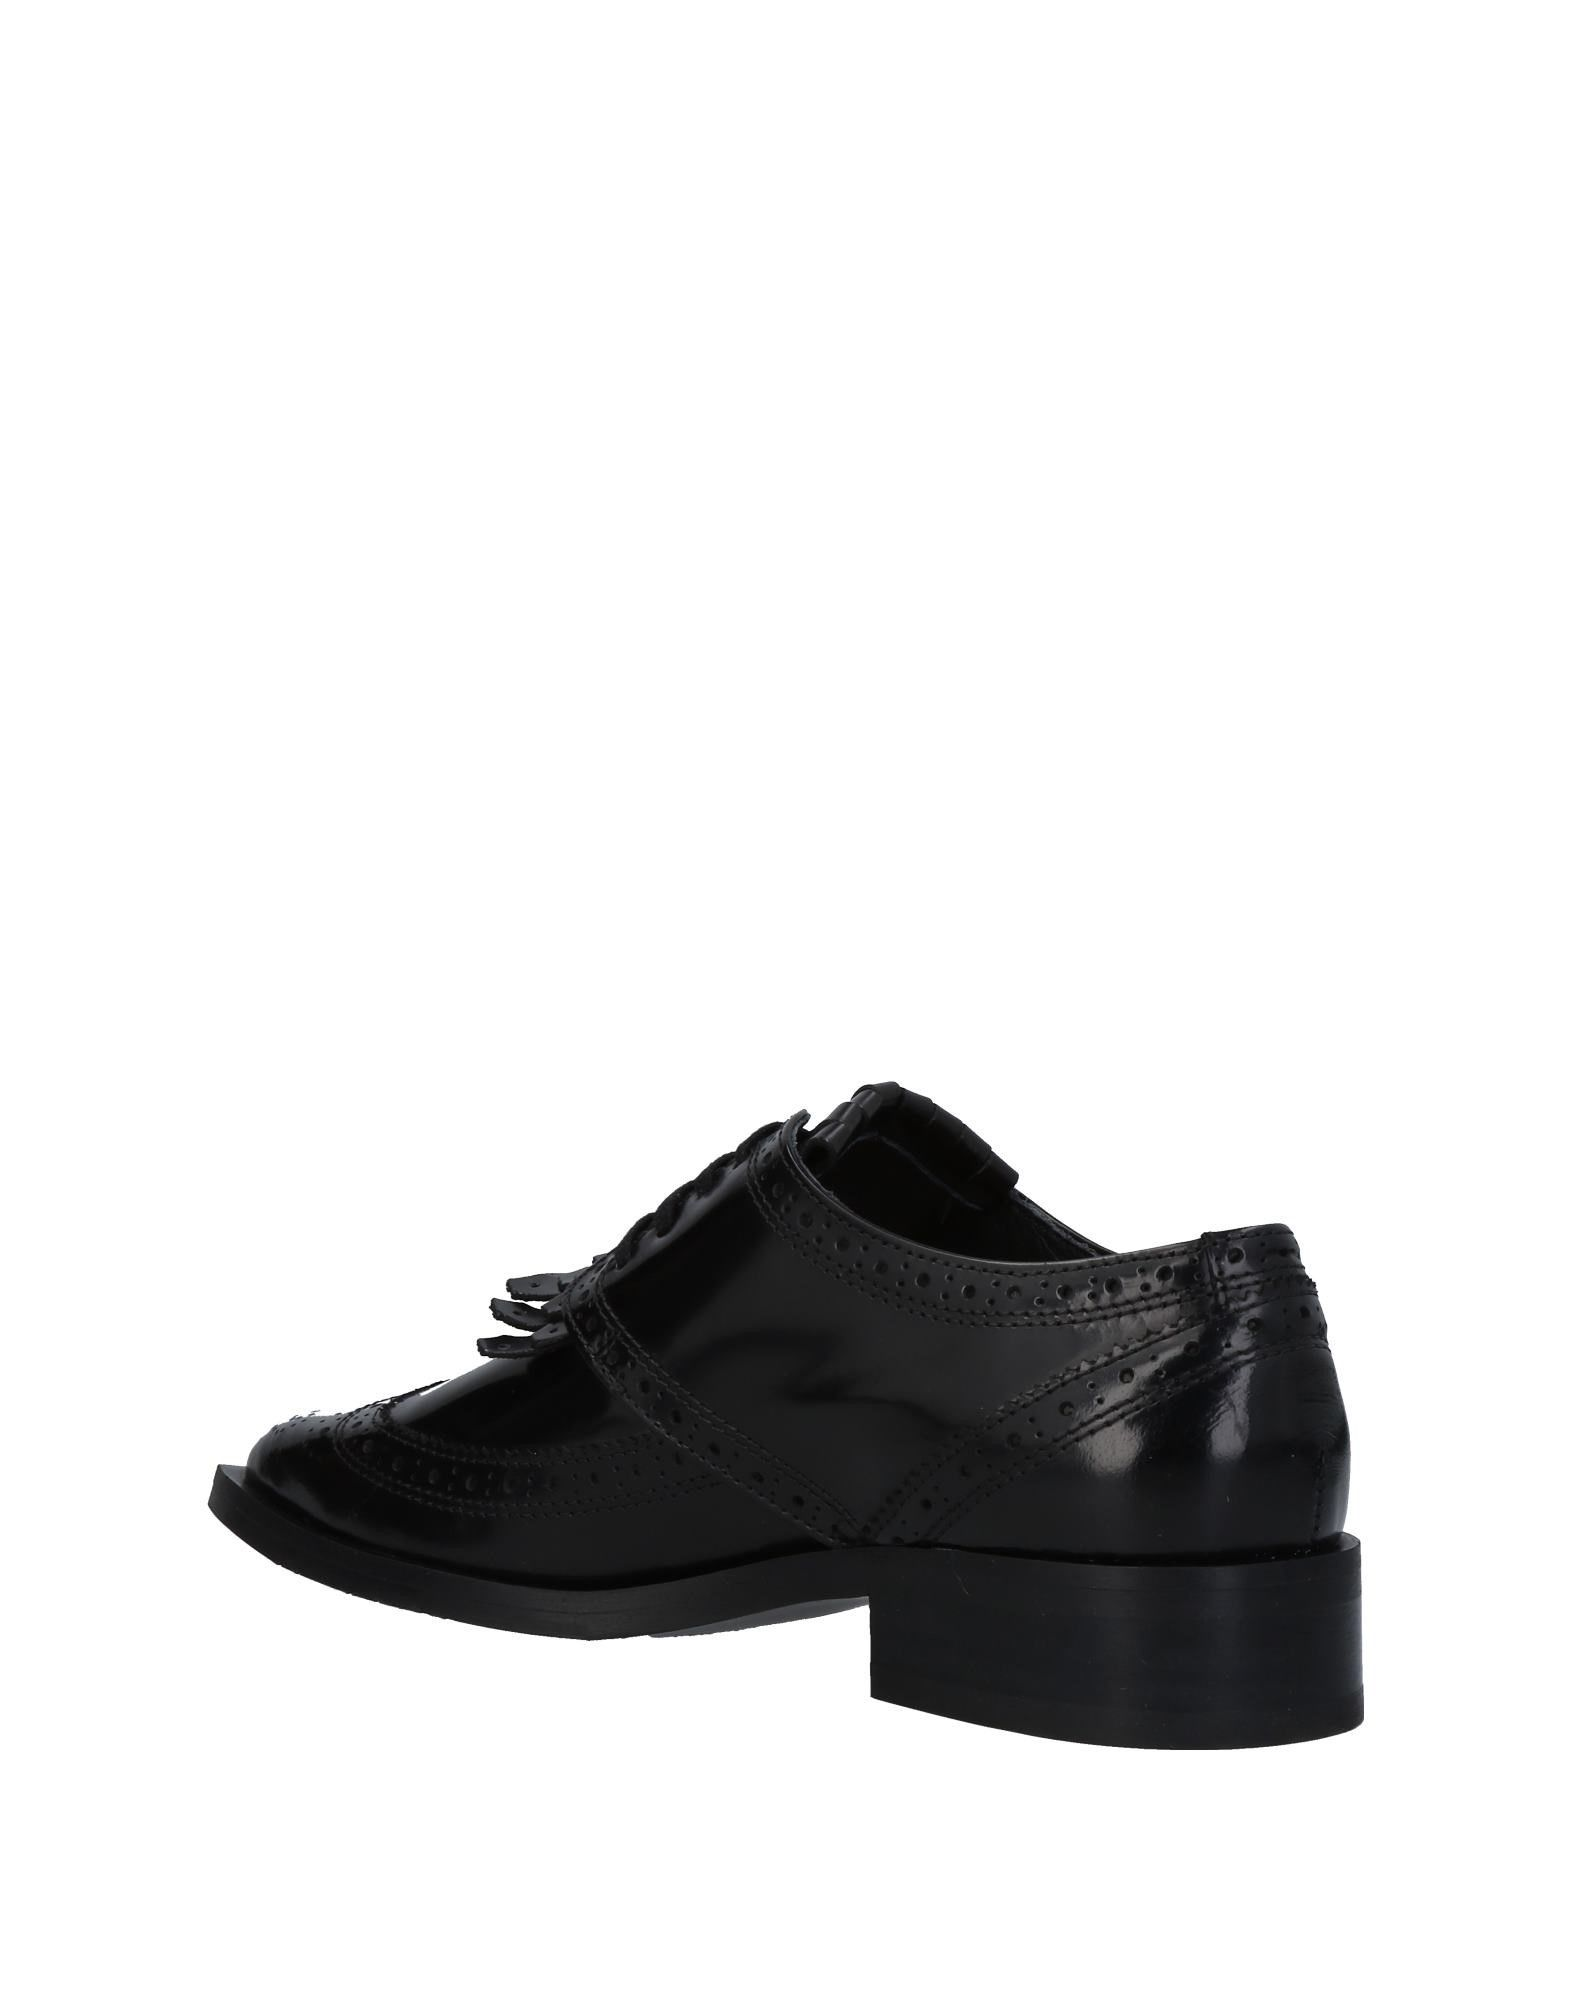 Chaussures - Chaussures À Lacets Republiq Royal BOza5rfK